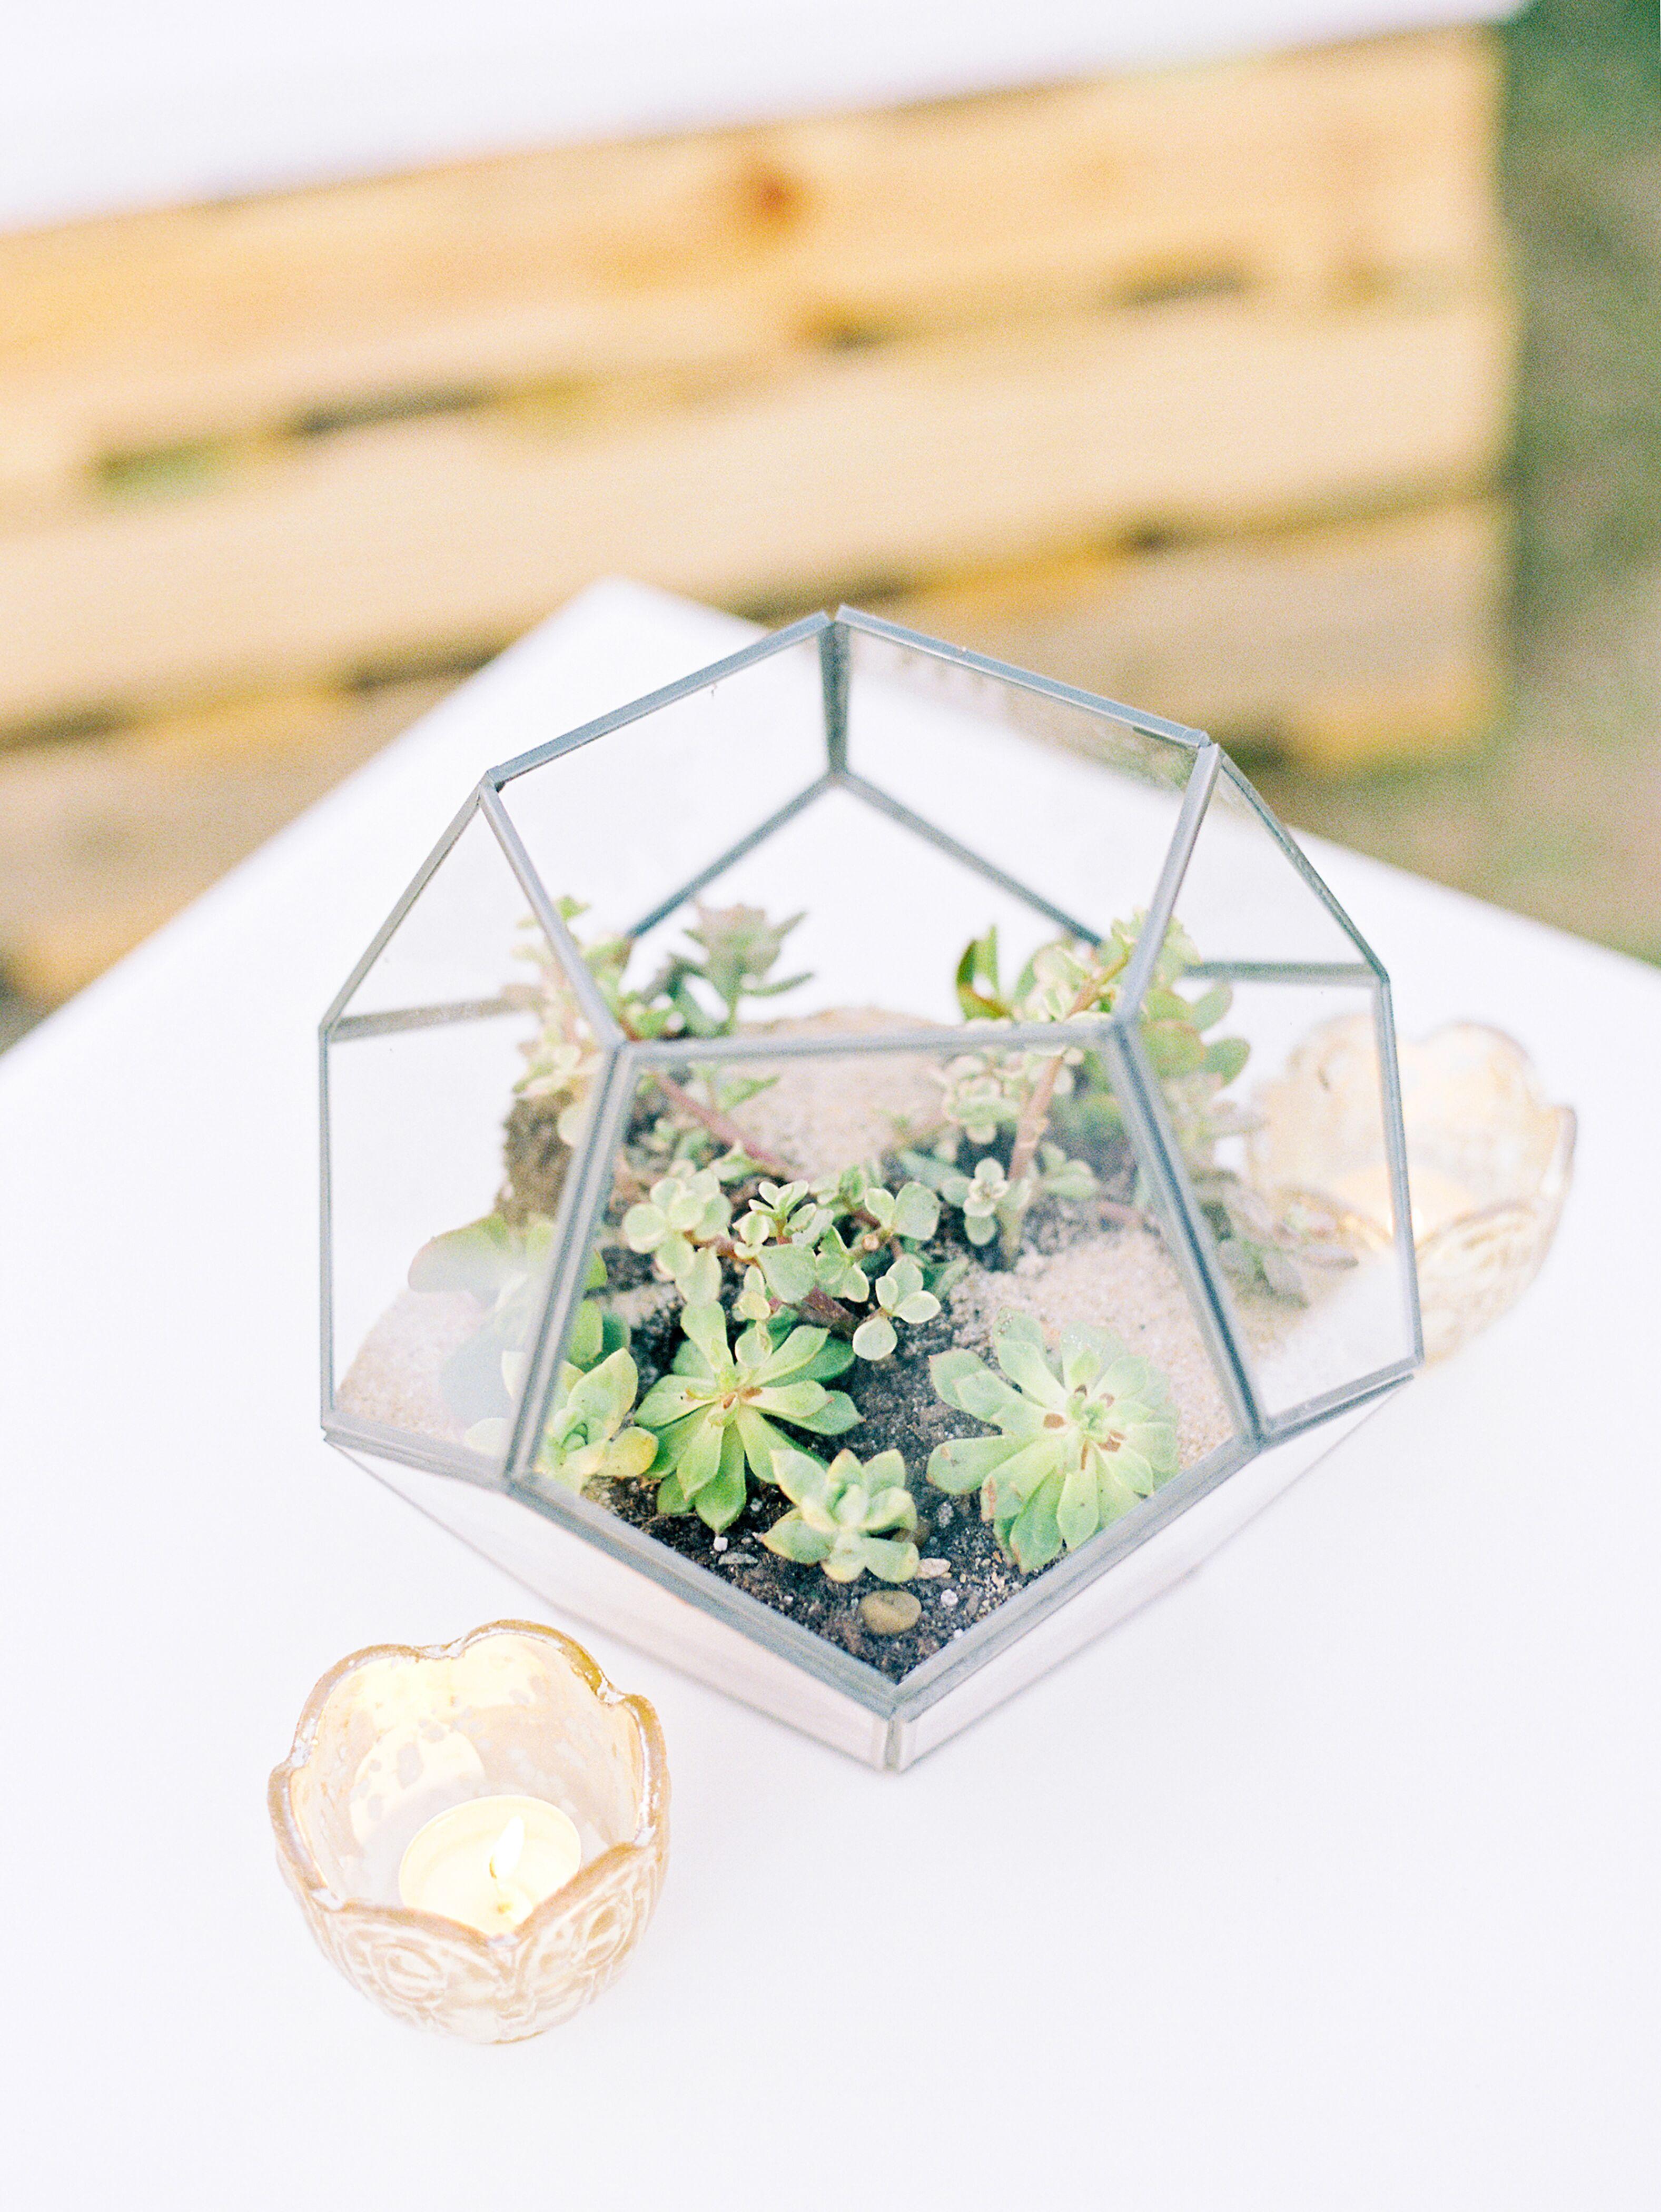 Geometric Succulent-Filled Terrarium Wedding Centerpiece